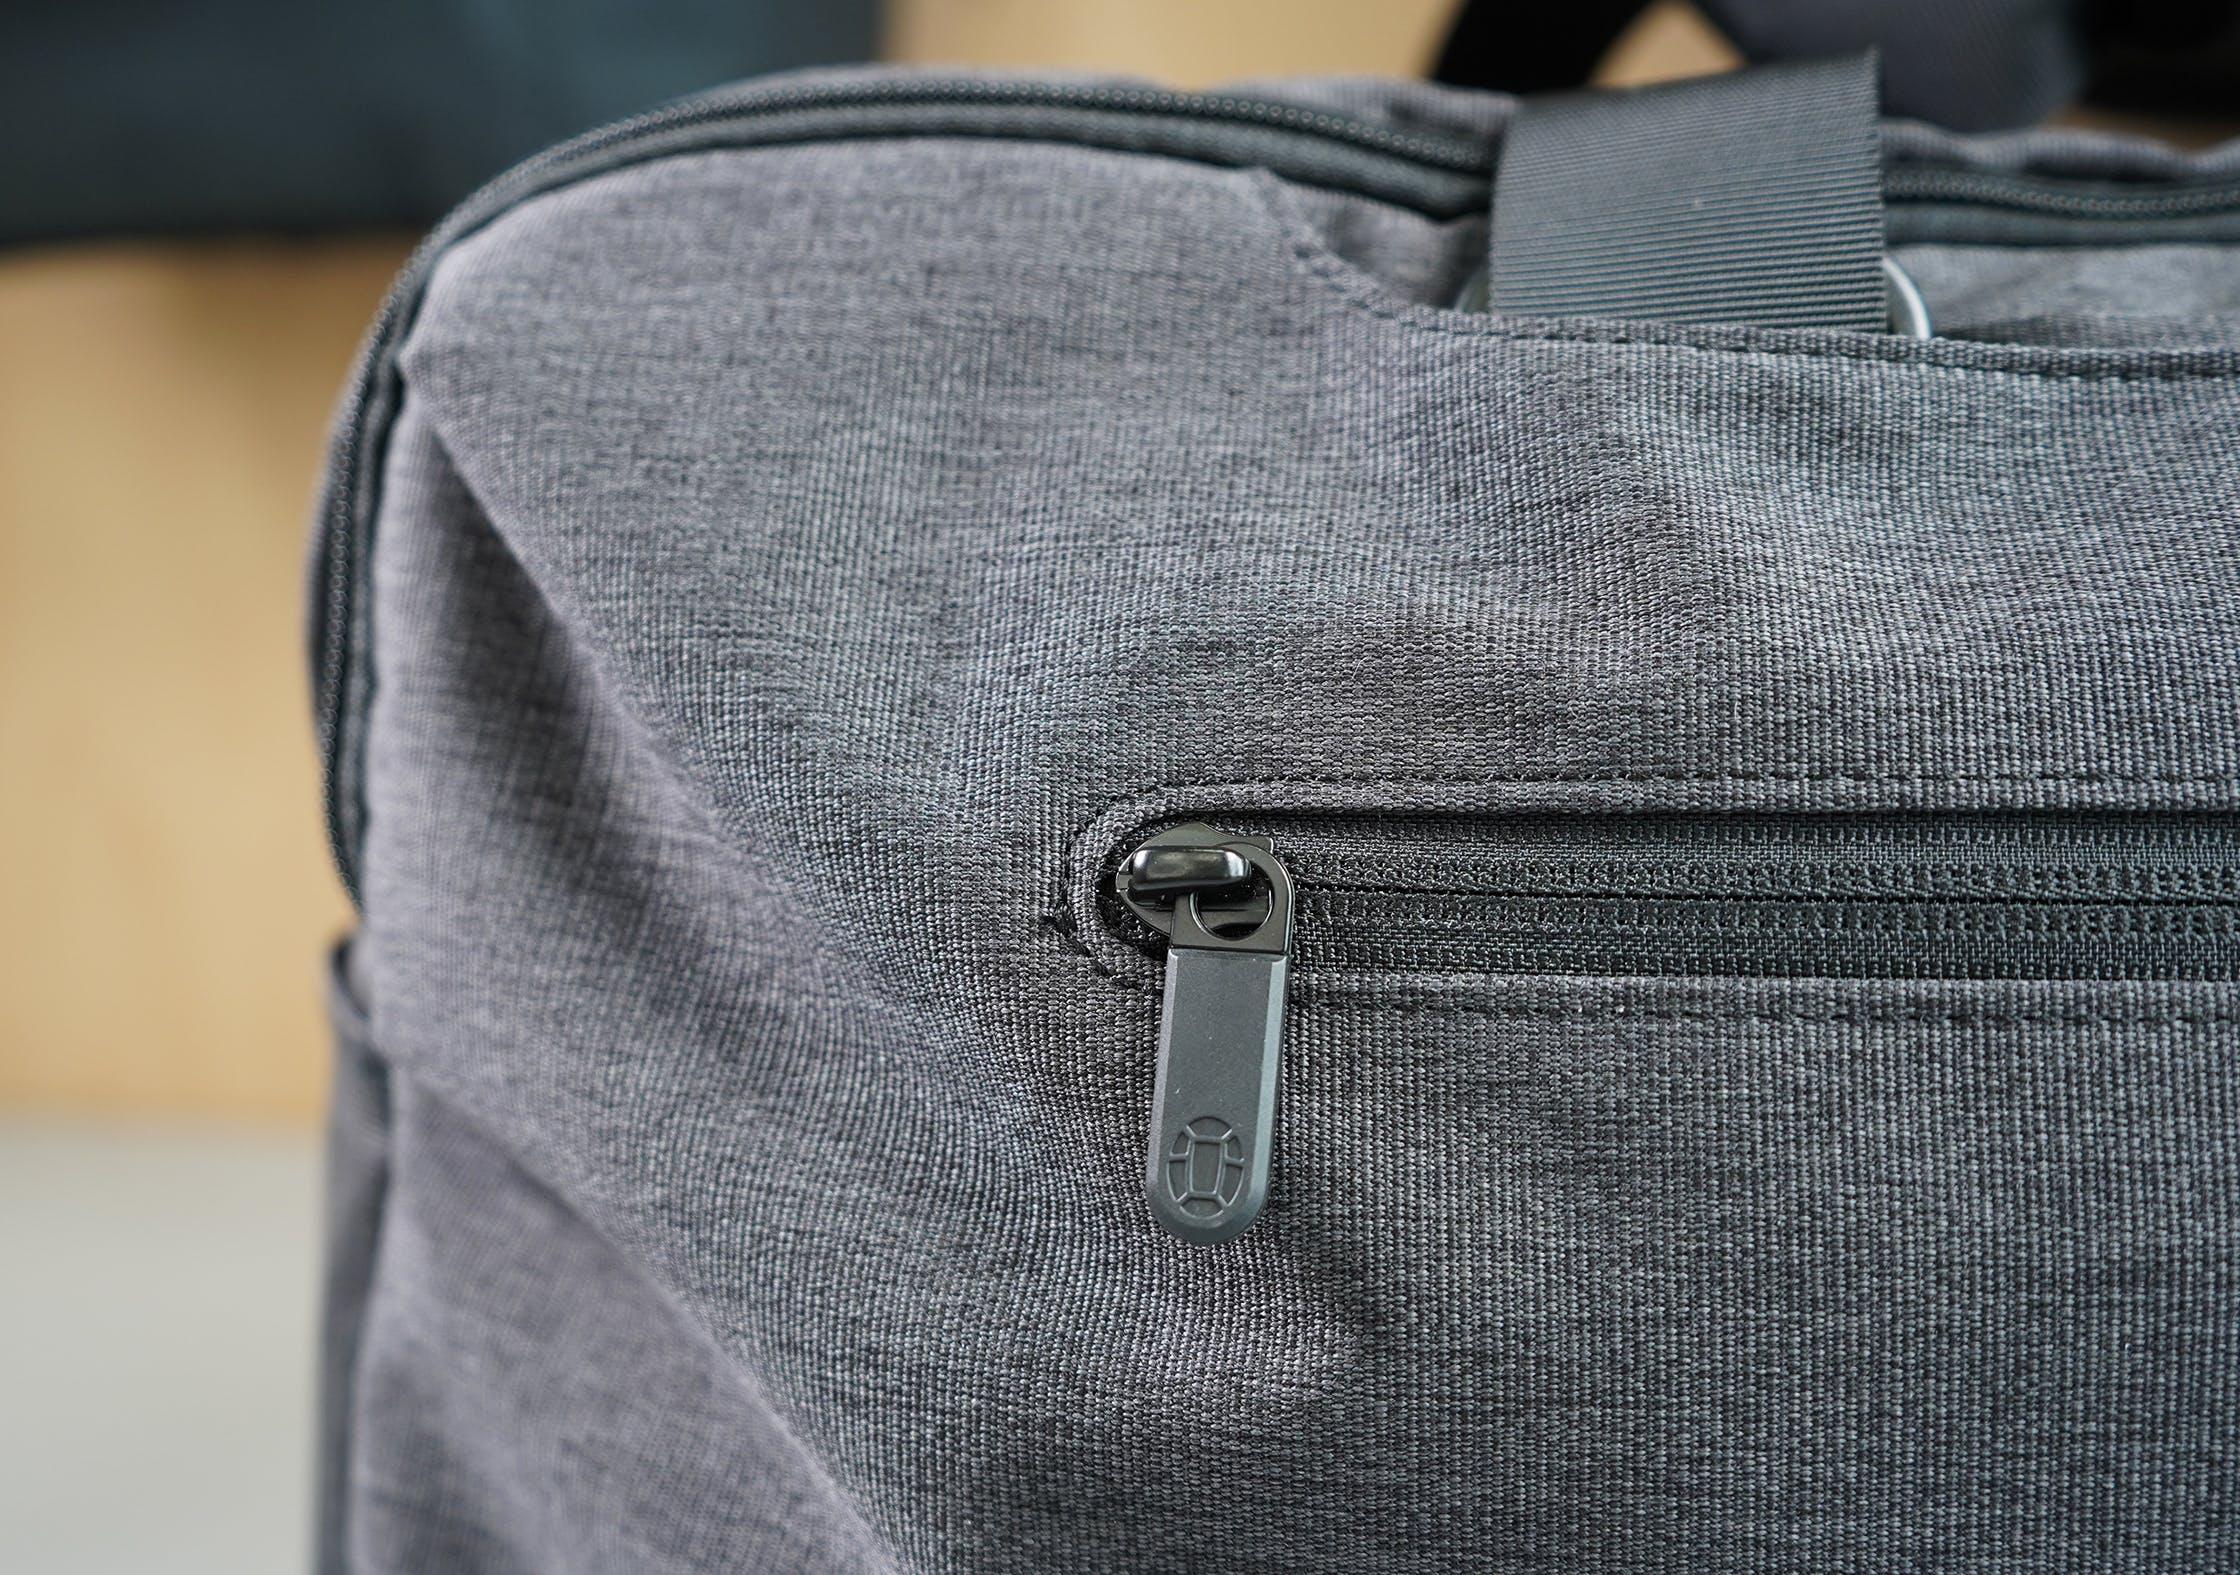 d98ee8c49f6c2 Tortuga Setout Duffle Bag Travel Review